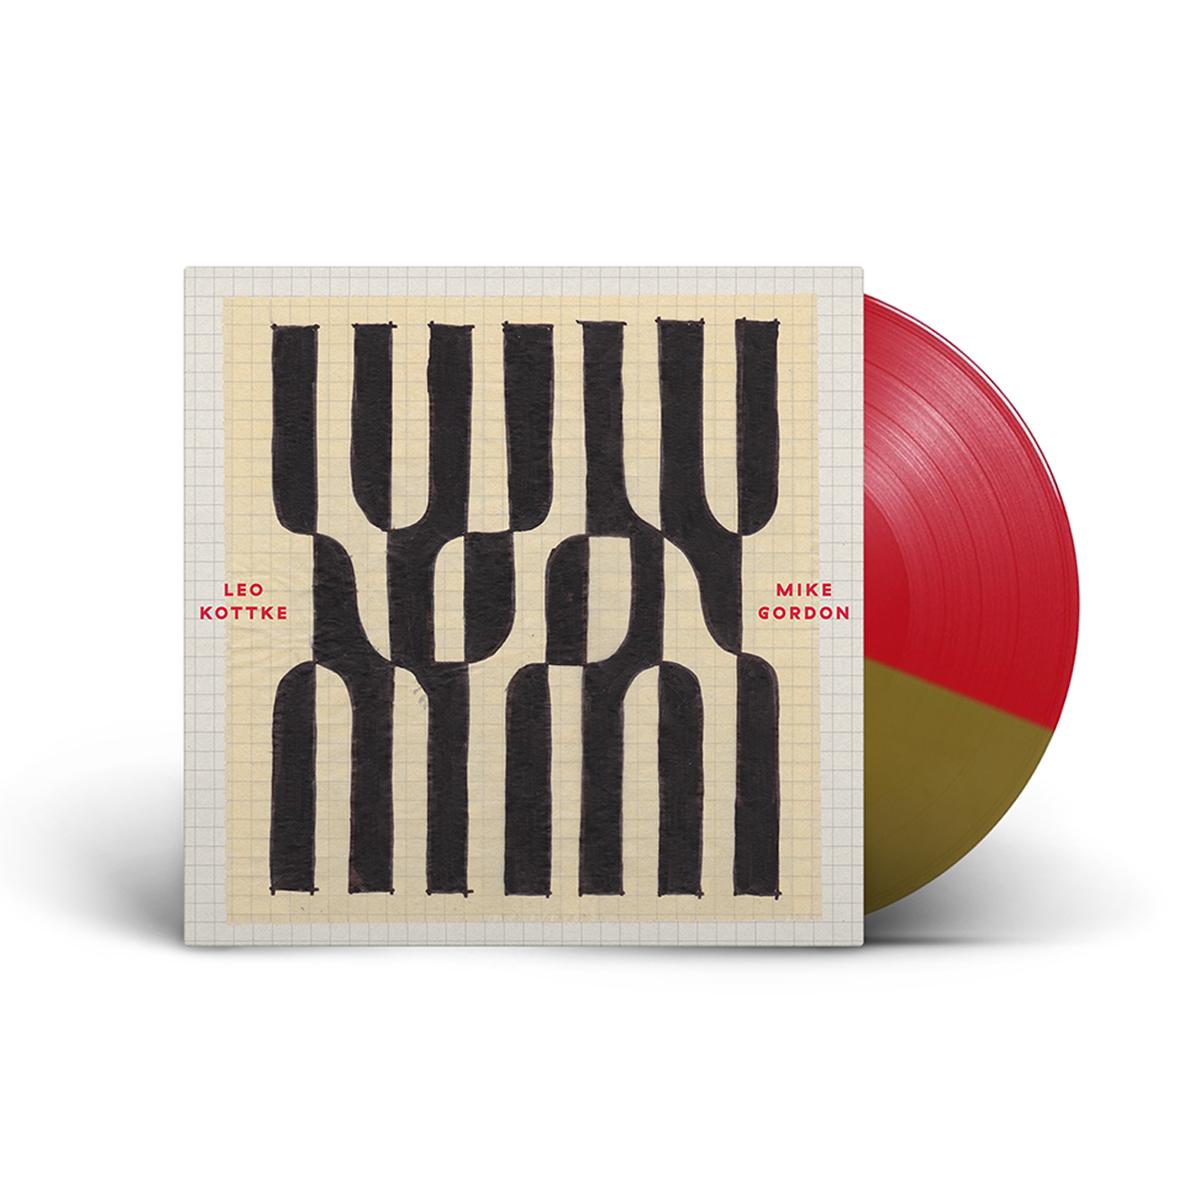 Leo Kottke & Mike Gordon Noon Red/Gold Split Colored Vinyl